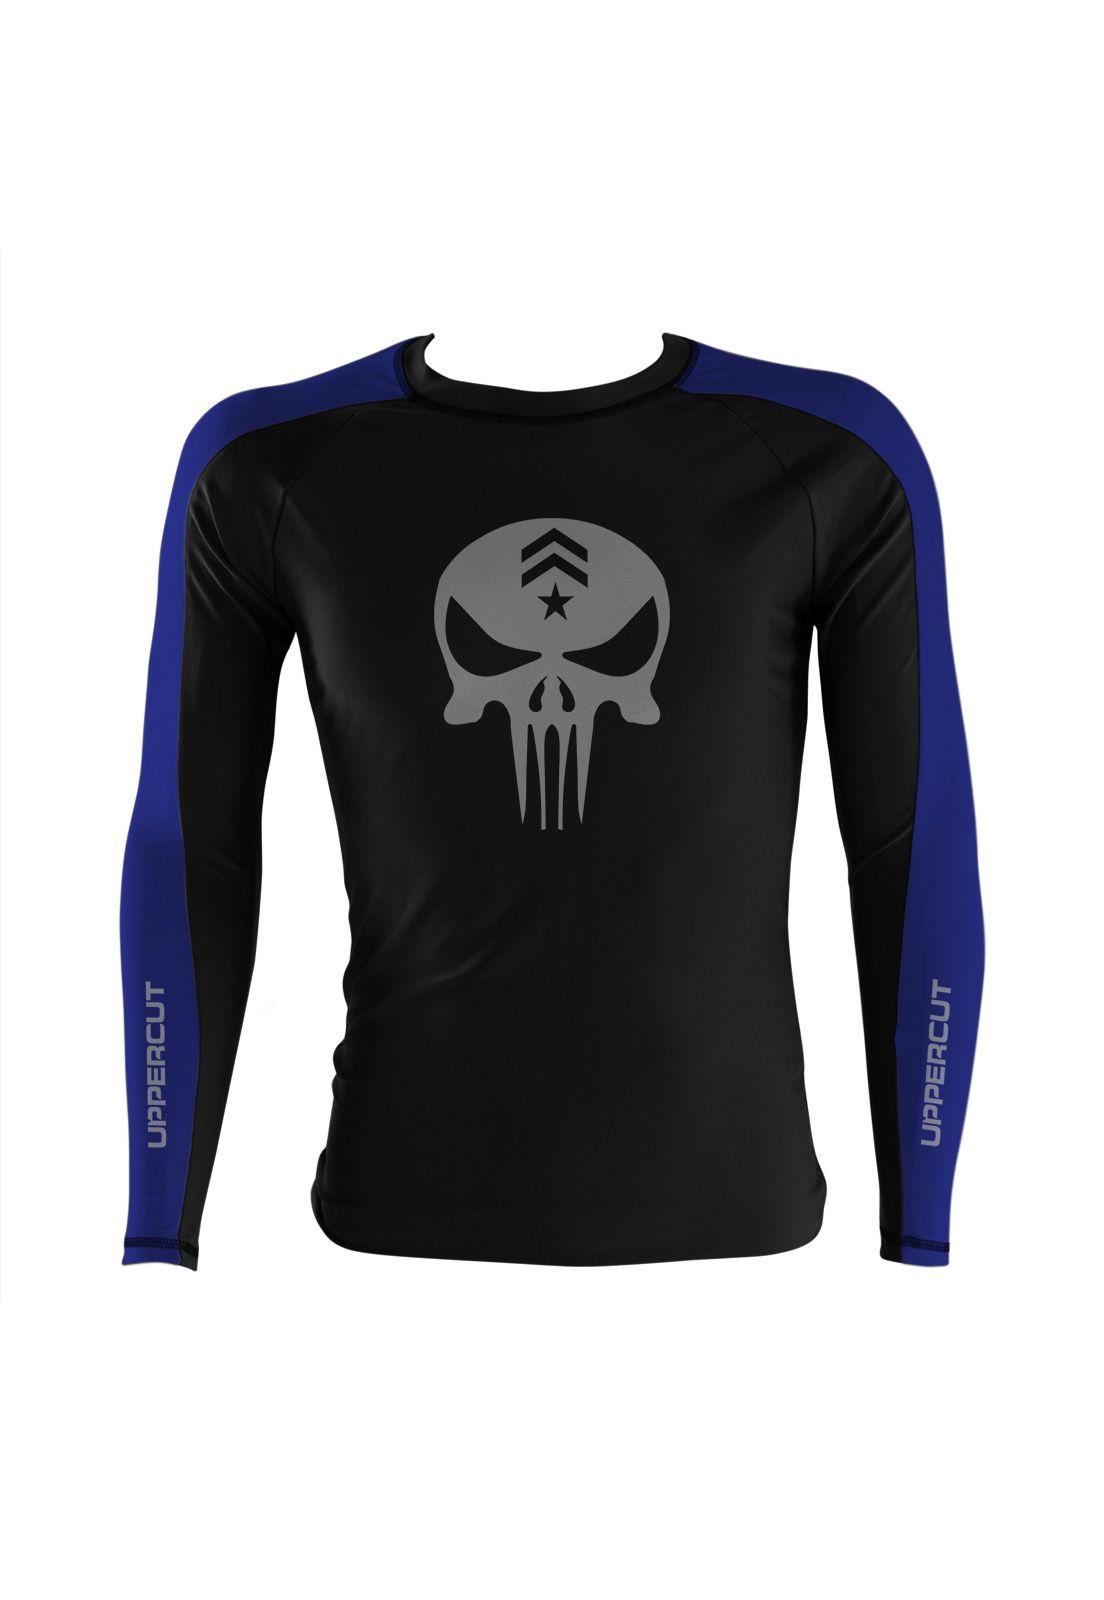 Camisa Rash Guard Justiceiro War R-3 - Preto/Azul - Uppercut